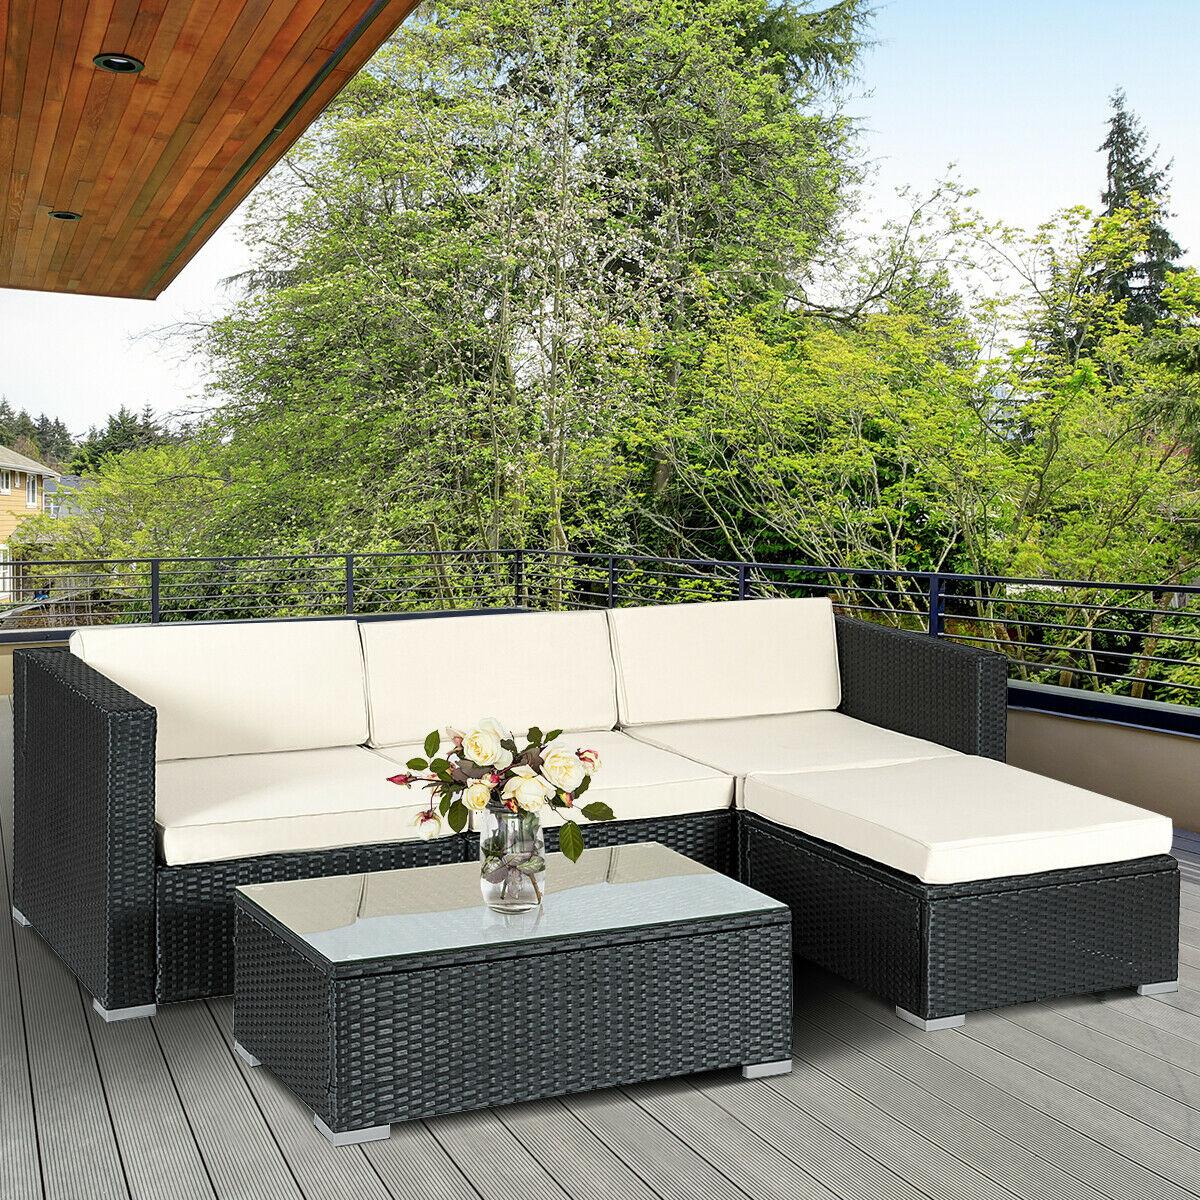 Costway 5 PCS Patio Furniture Set Rattan Wicker Table Shelf Garden